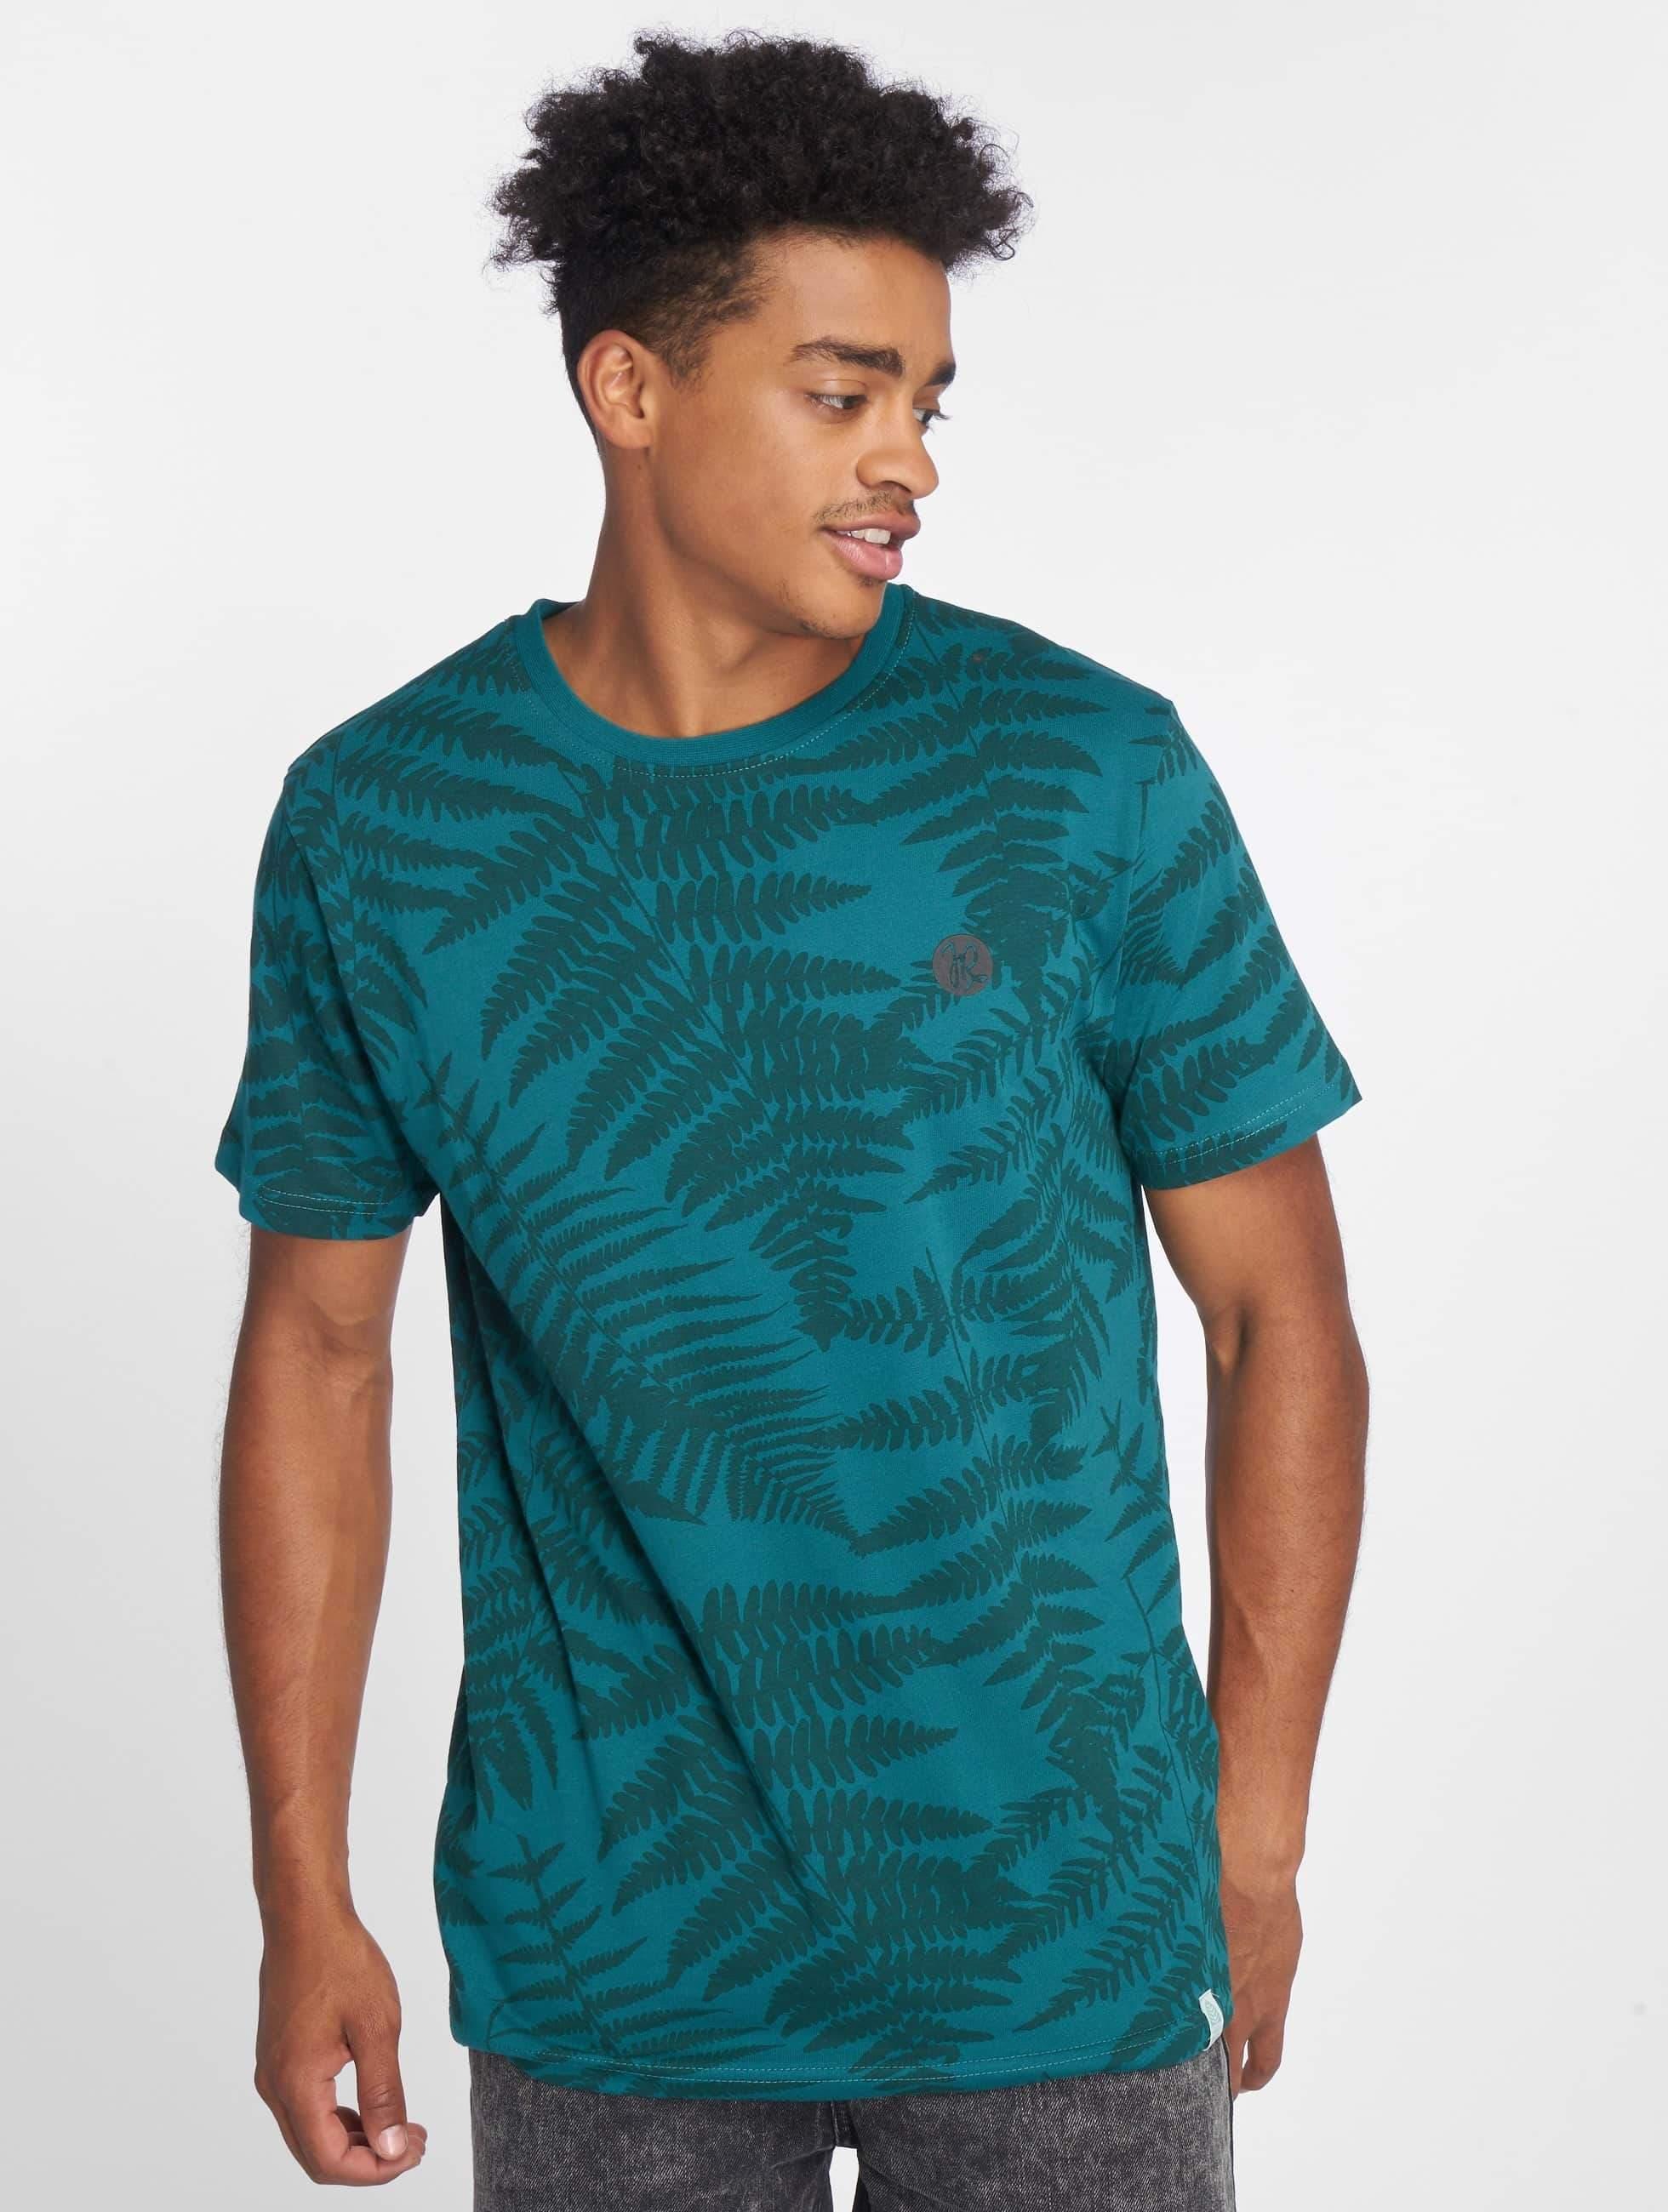 Just Rhyse / T-Shirt Zorritos in green 3XL